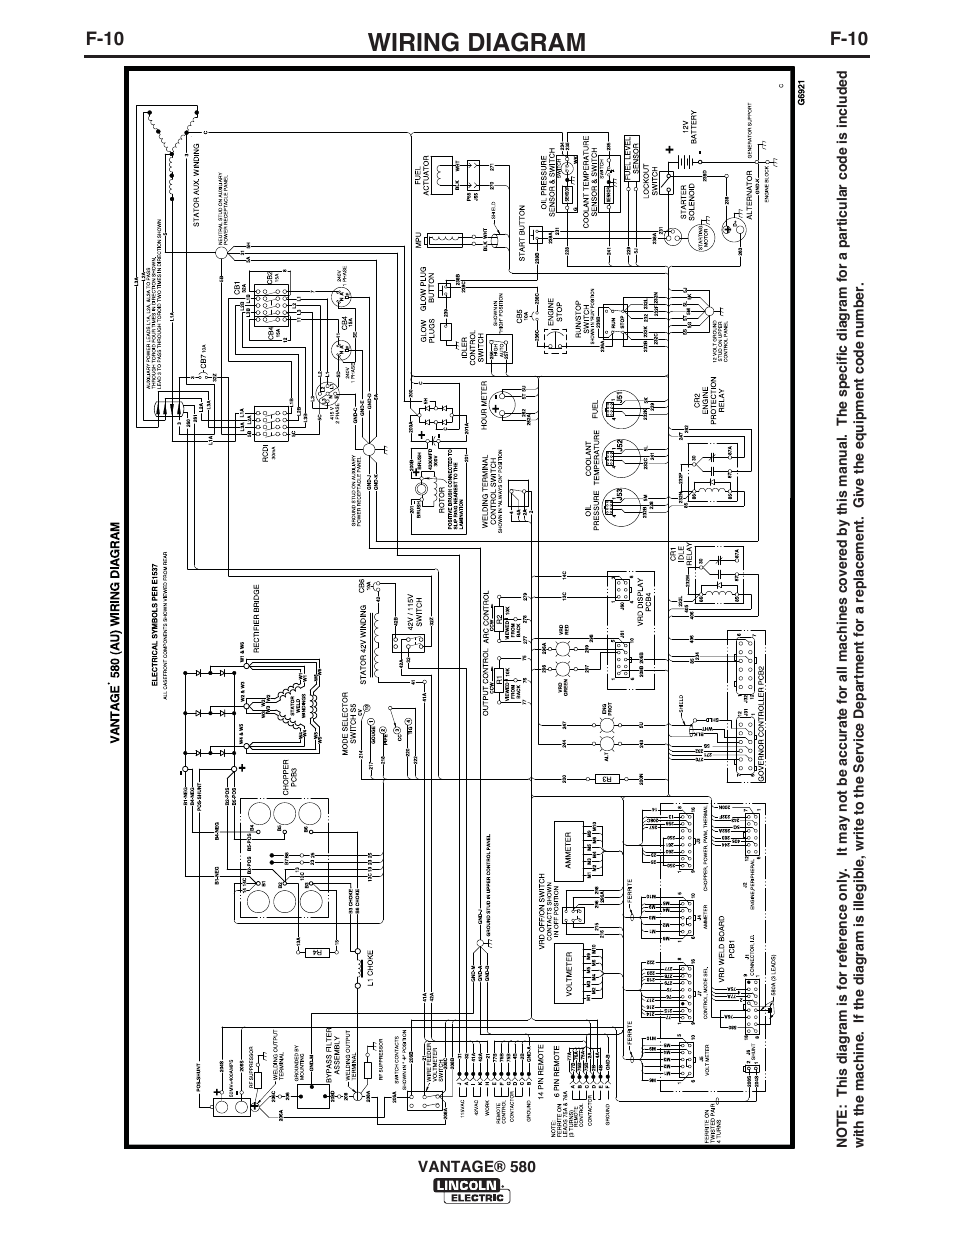 Guitar wiring diagrams for vantage wiring diagram